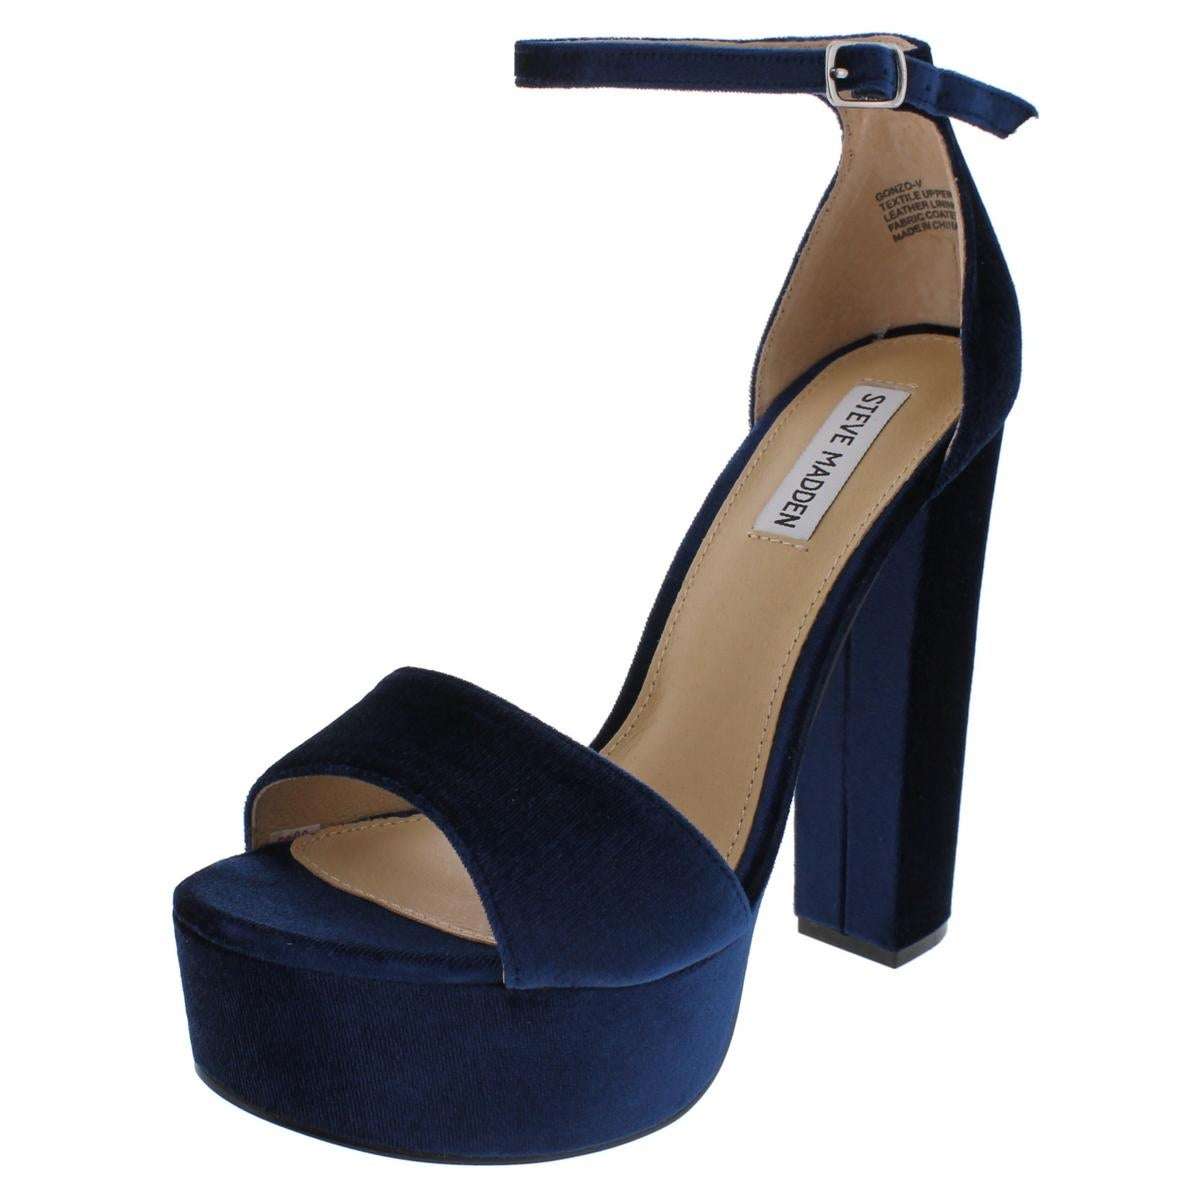 ca451d71bc5 Shop Steve Madden Womens Gonzo Dress Sandals Platform - Ships To Canada -  Overstock - 17379325